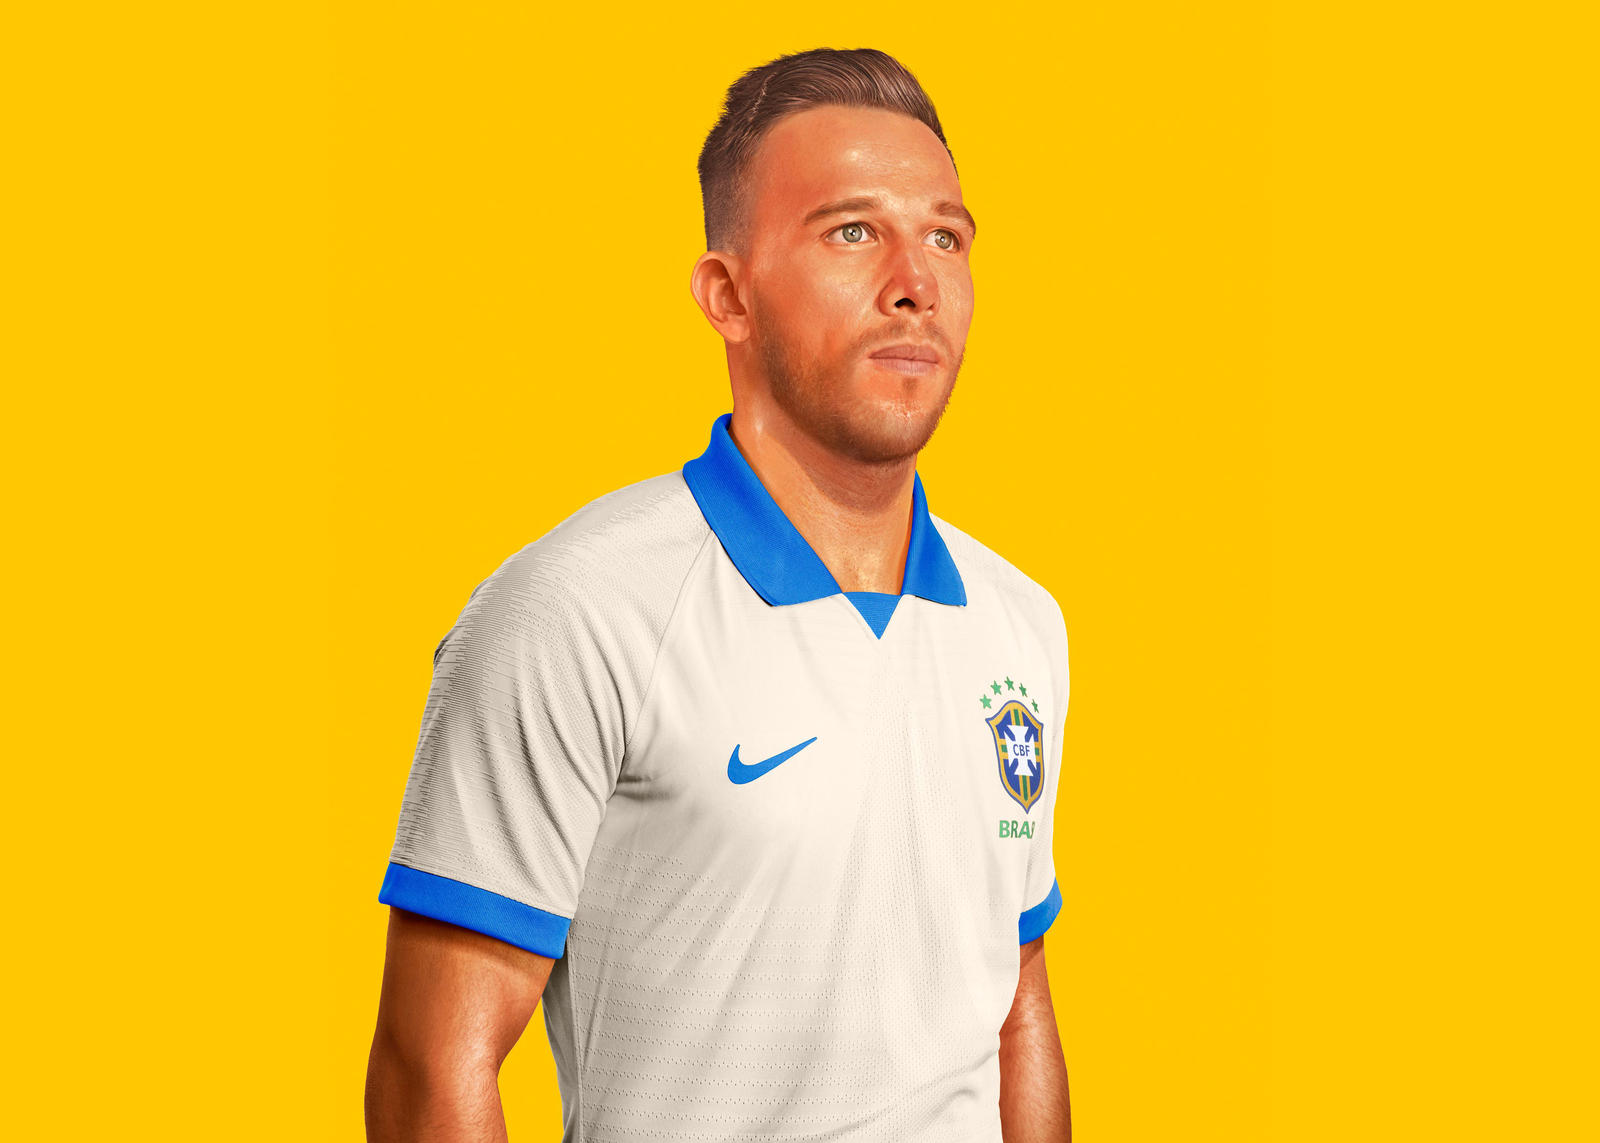 nike-brasil-copa-america-100th-anniversary-jersey-3_rectangle_1600